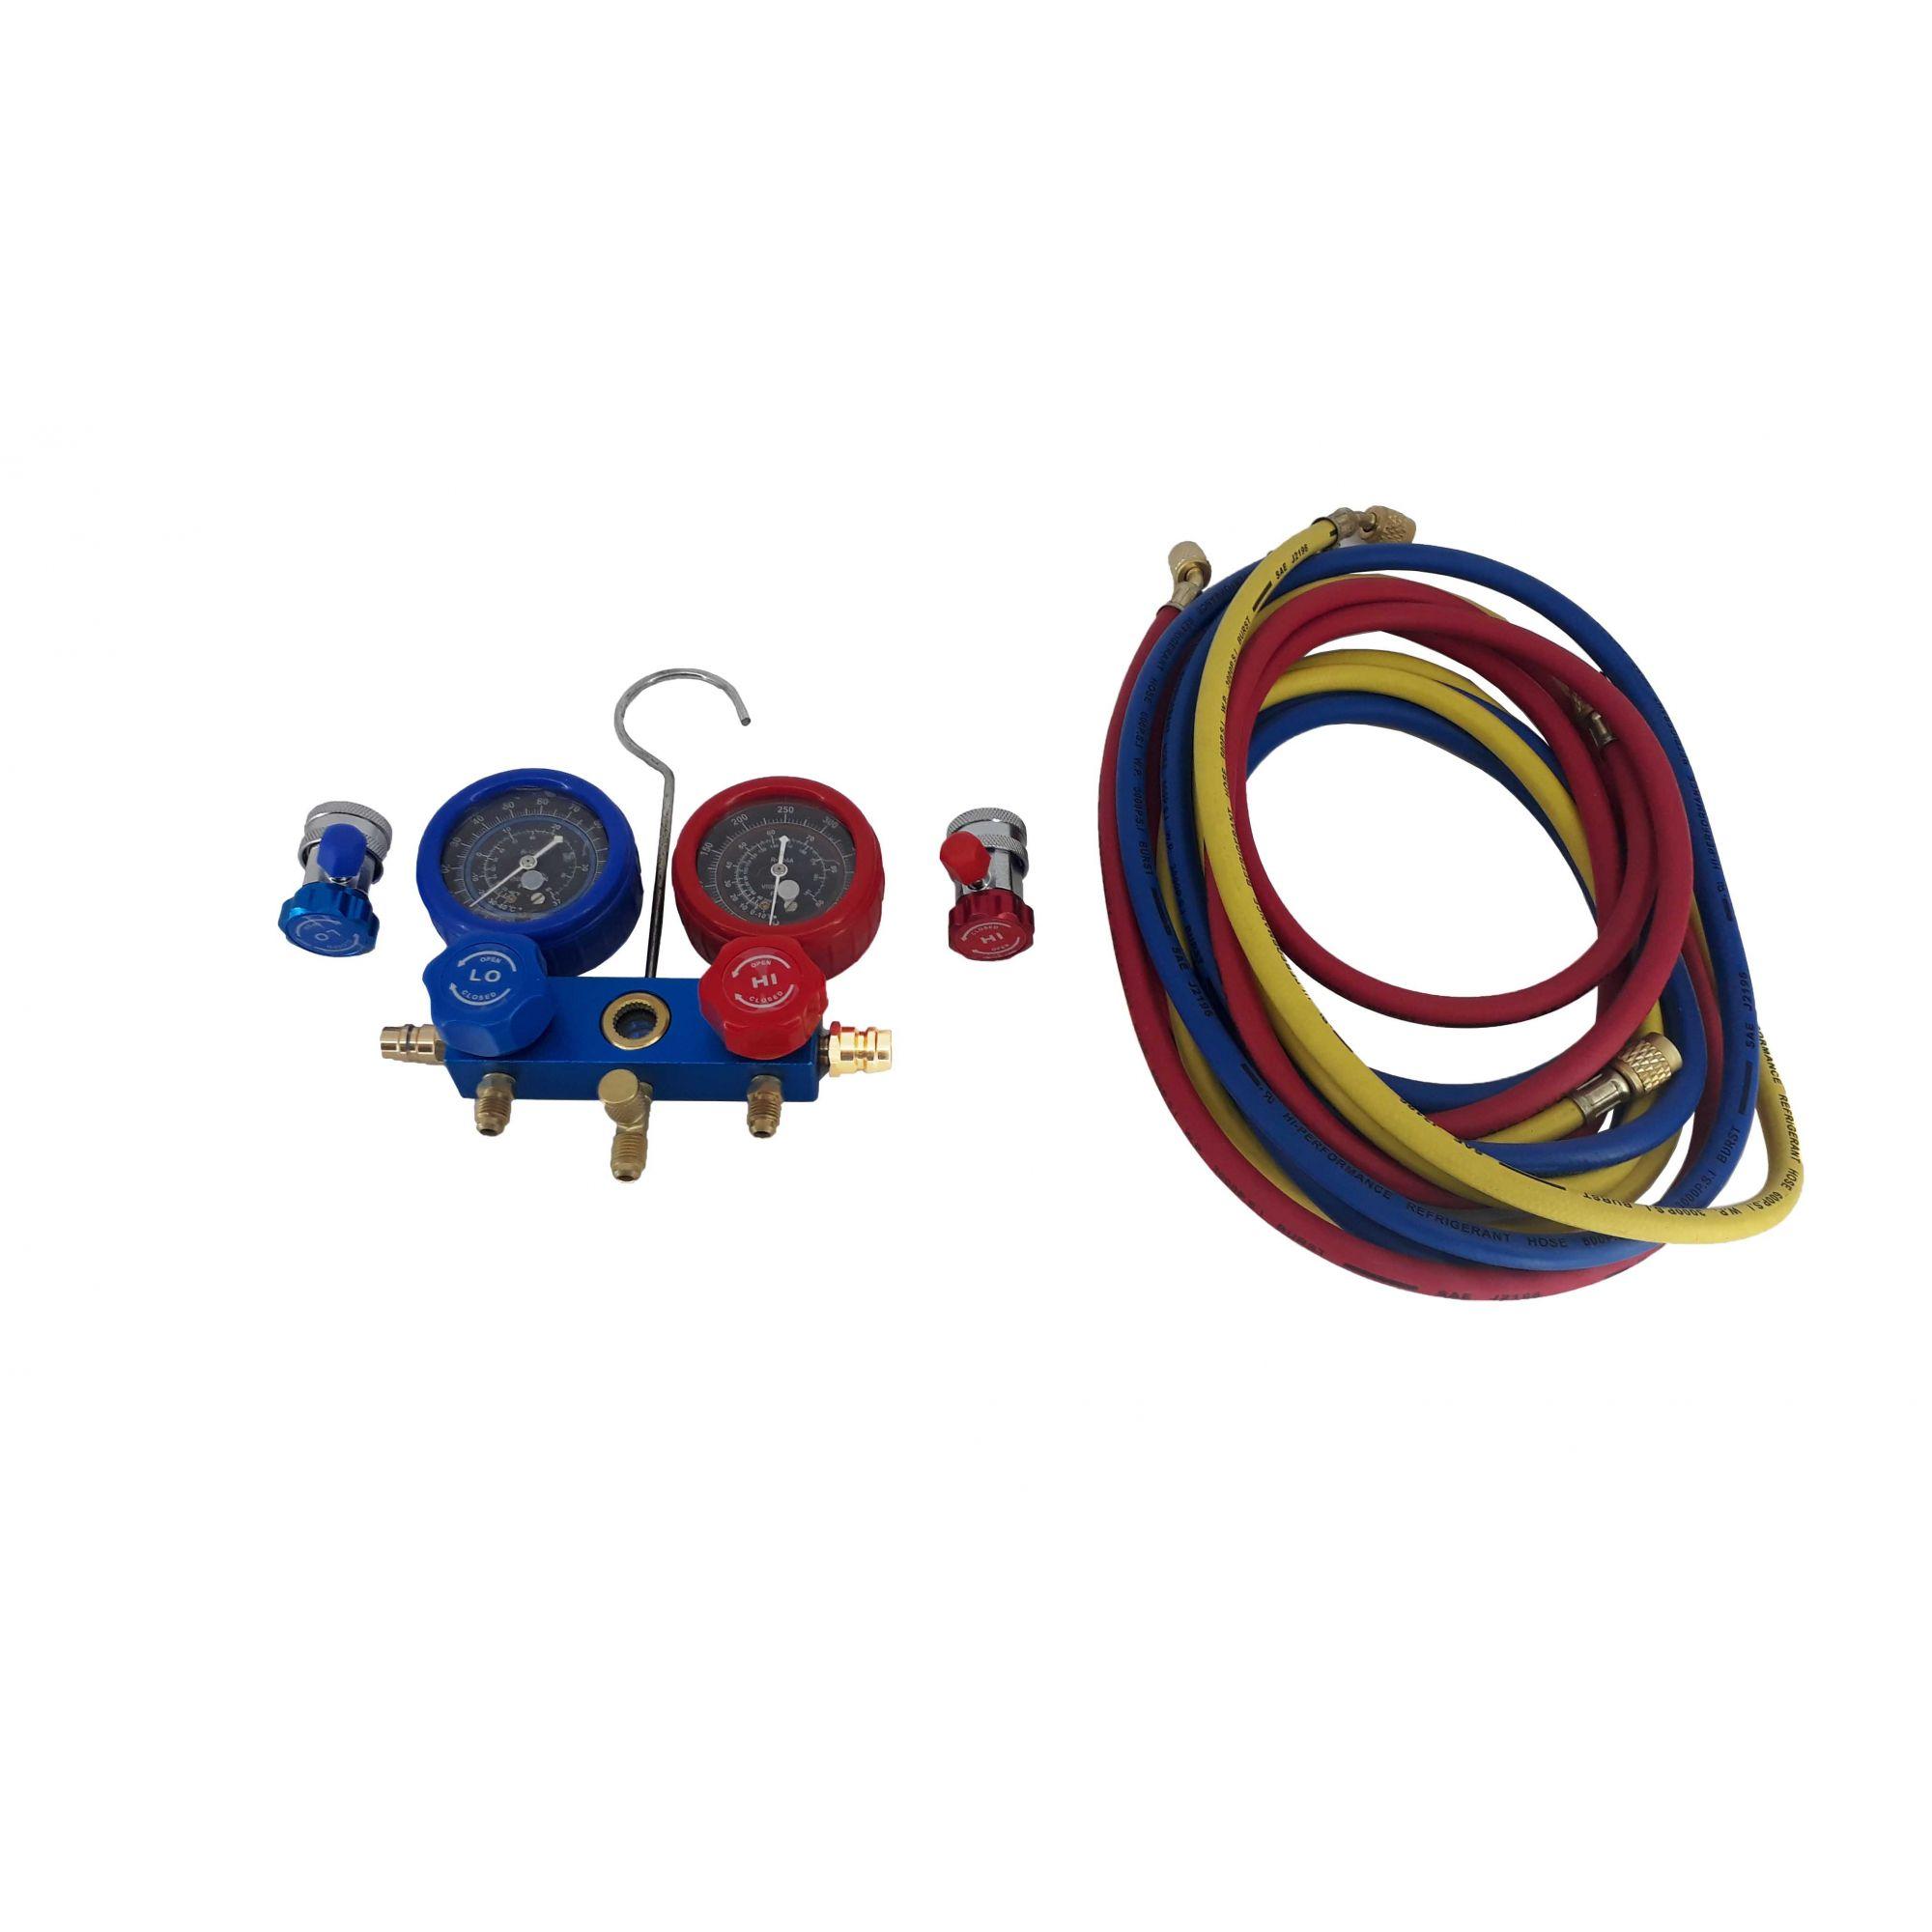 Kit Manômetro para ar condicionado automotivo